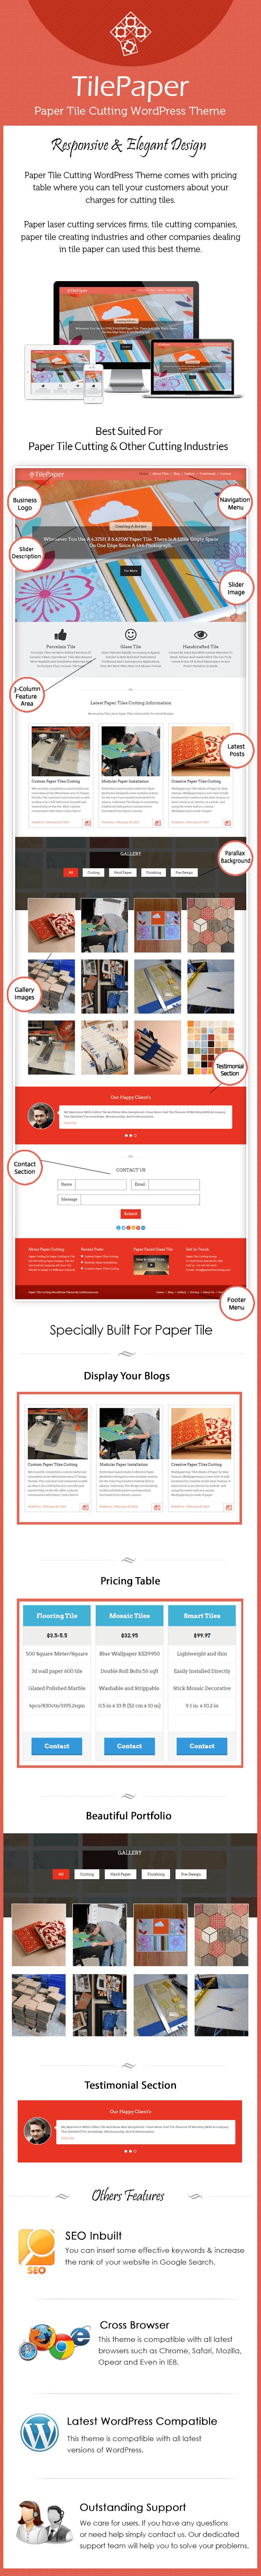 Paper Tile Cutting WordPress Theme